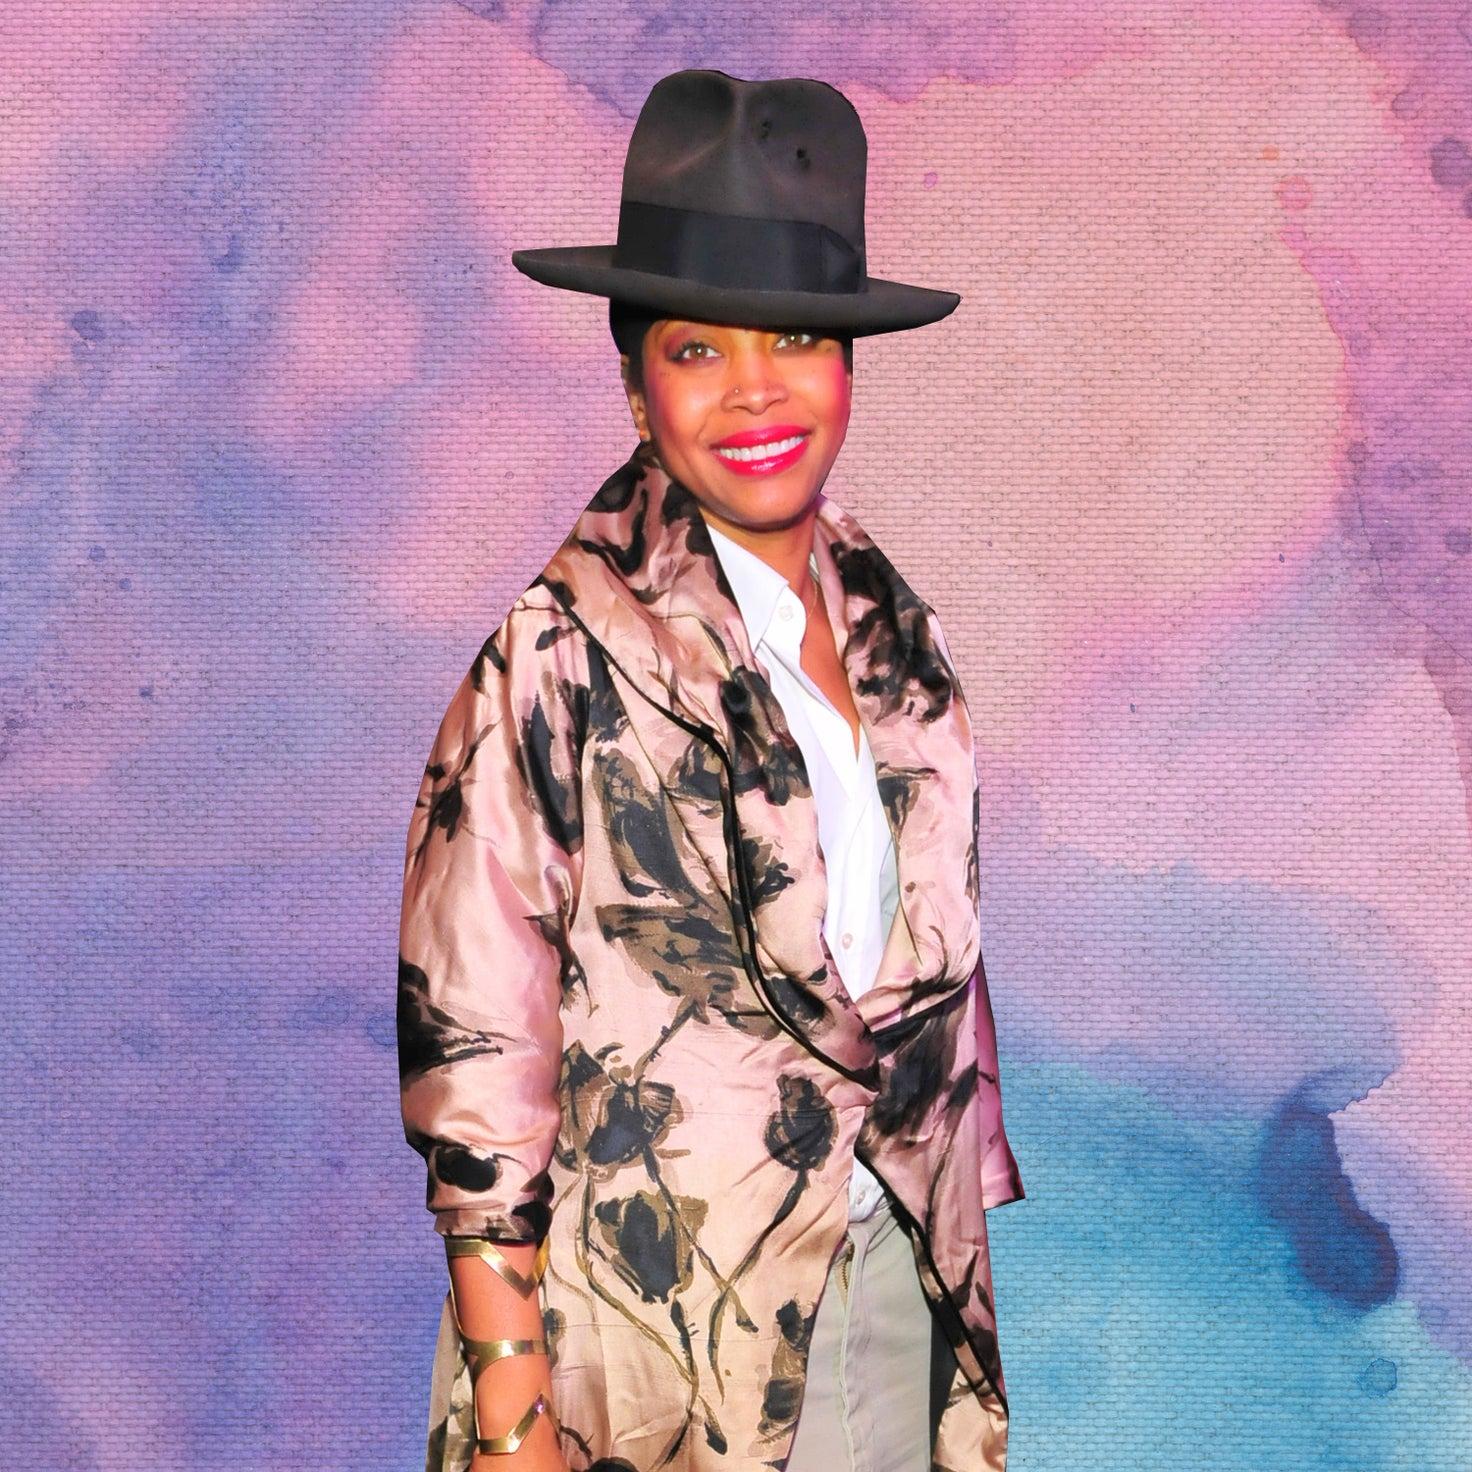 ESSENCE To Celebrate 20th Anniversary of Erykah Badu's 'Baduizm' At 2017 'Black Women In Music' Event